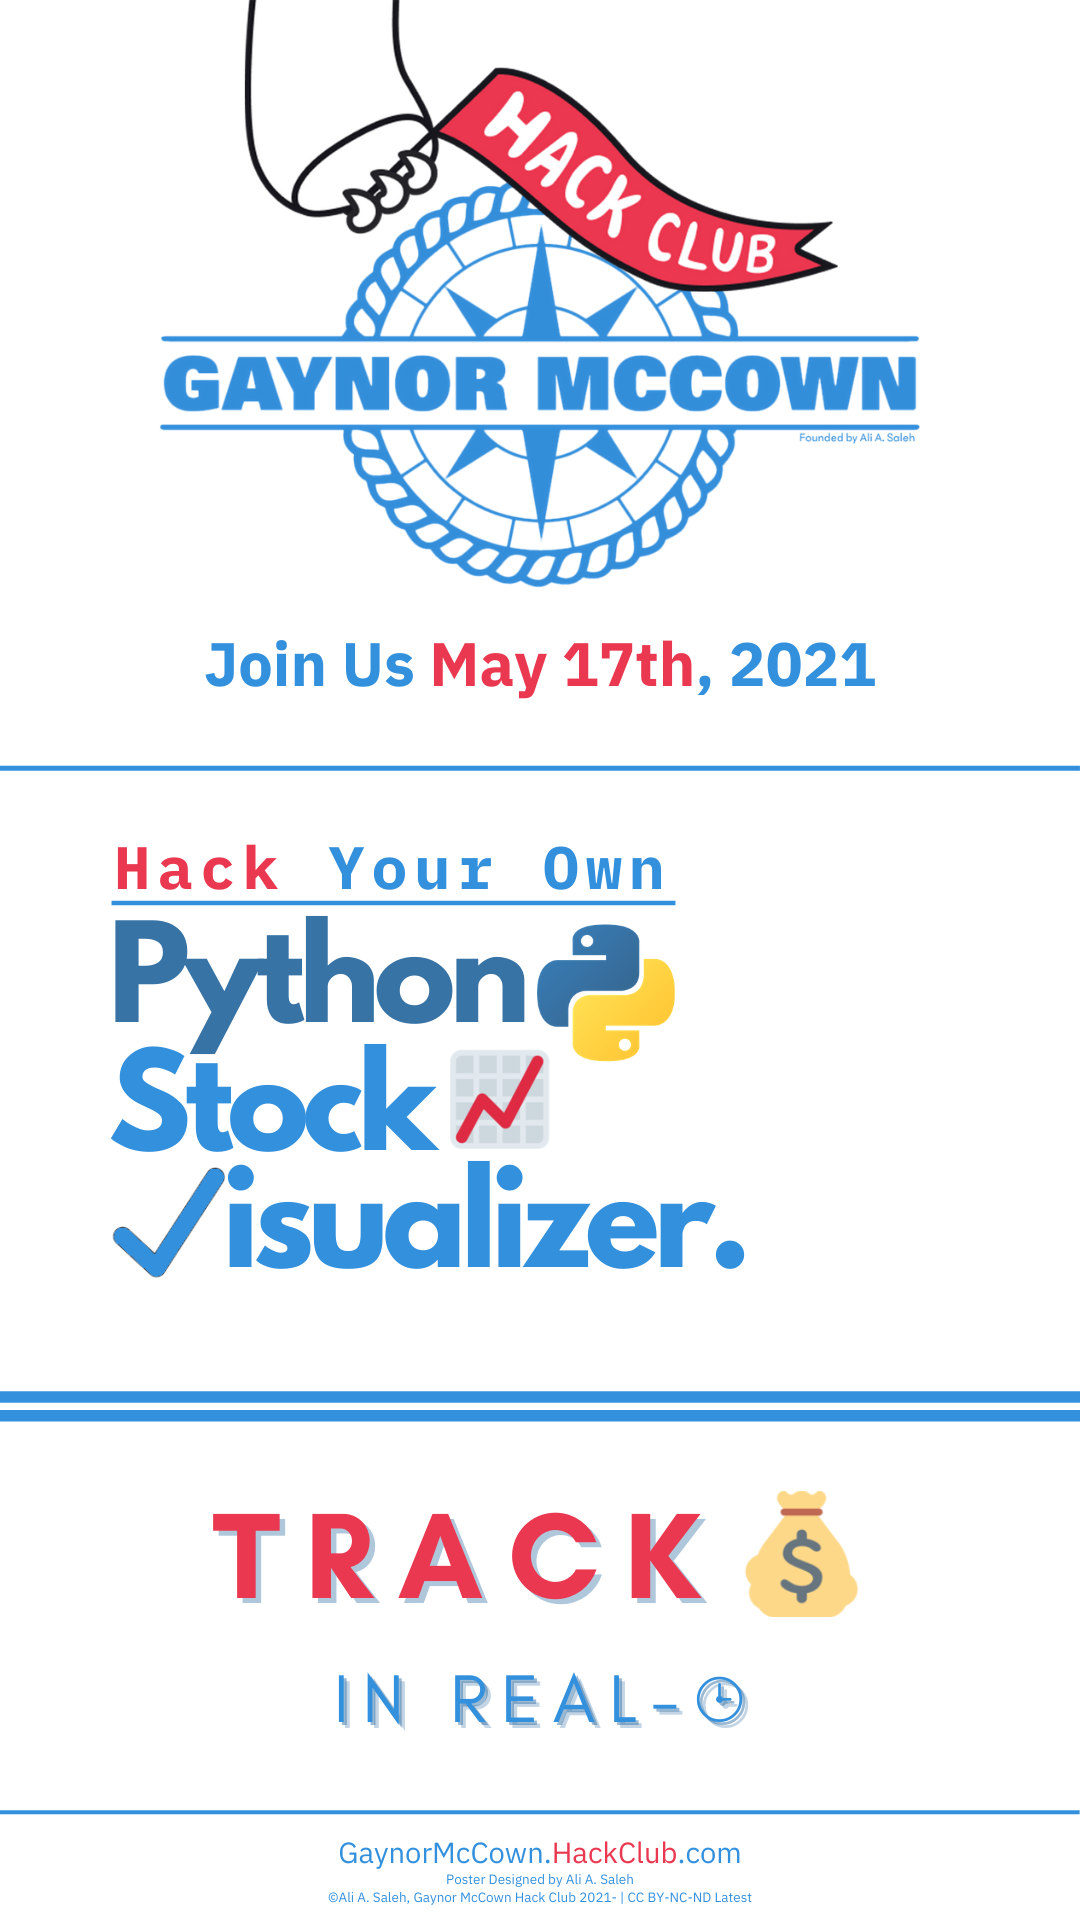 https://cloud-39p4lxm7d-hack-club-bot.vercel.app/0python_stock_visualizer_hc_2021.png